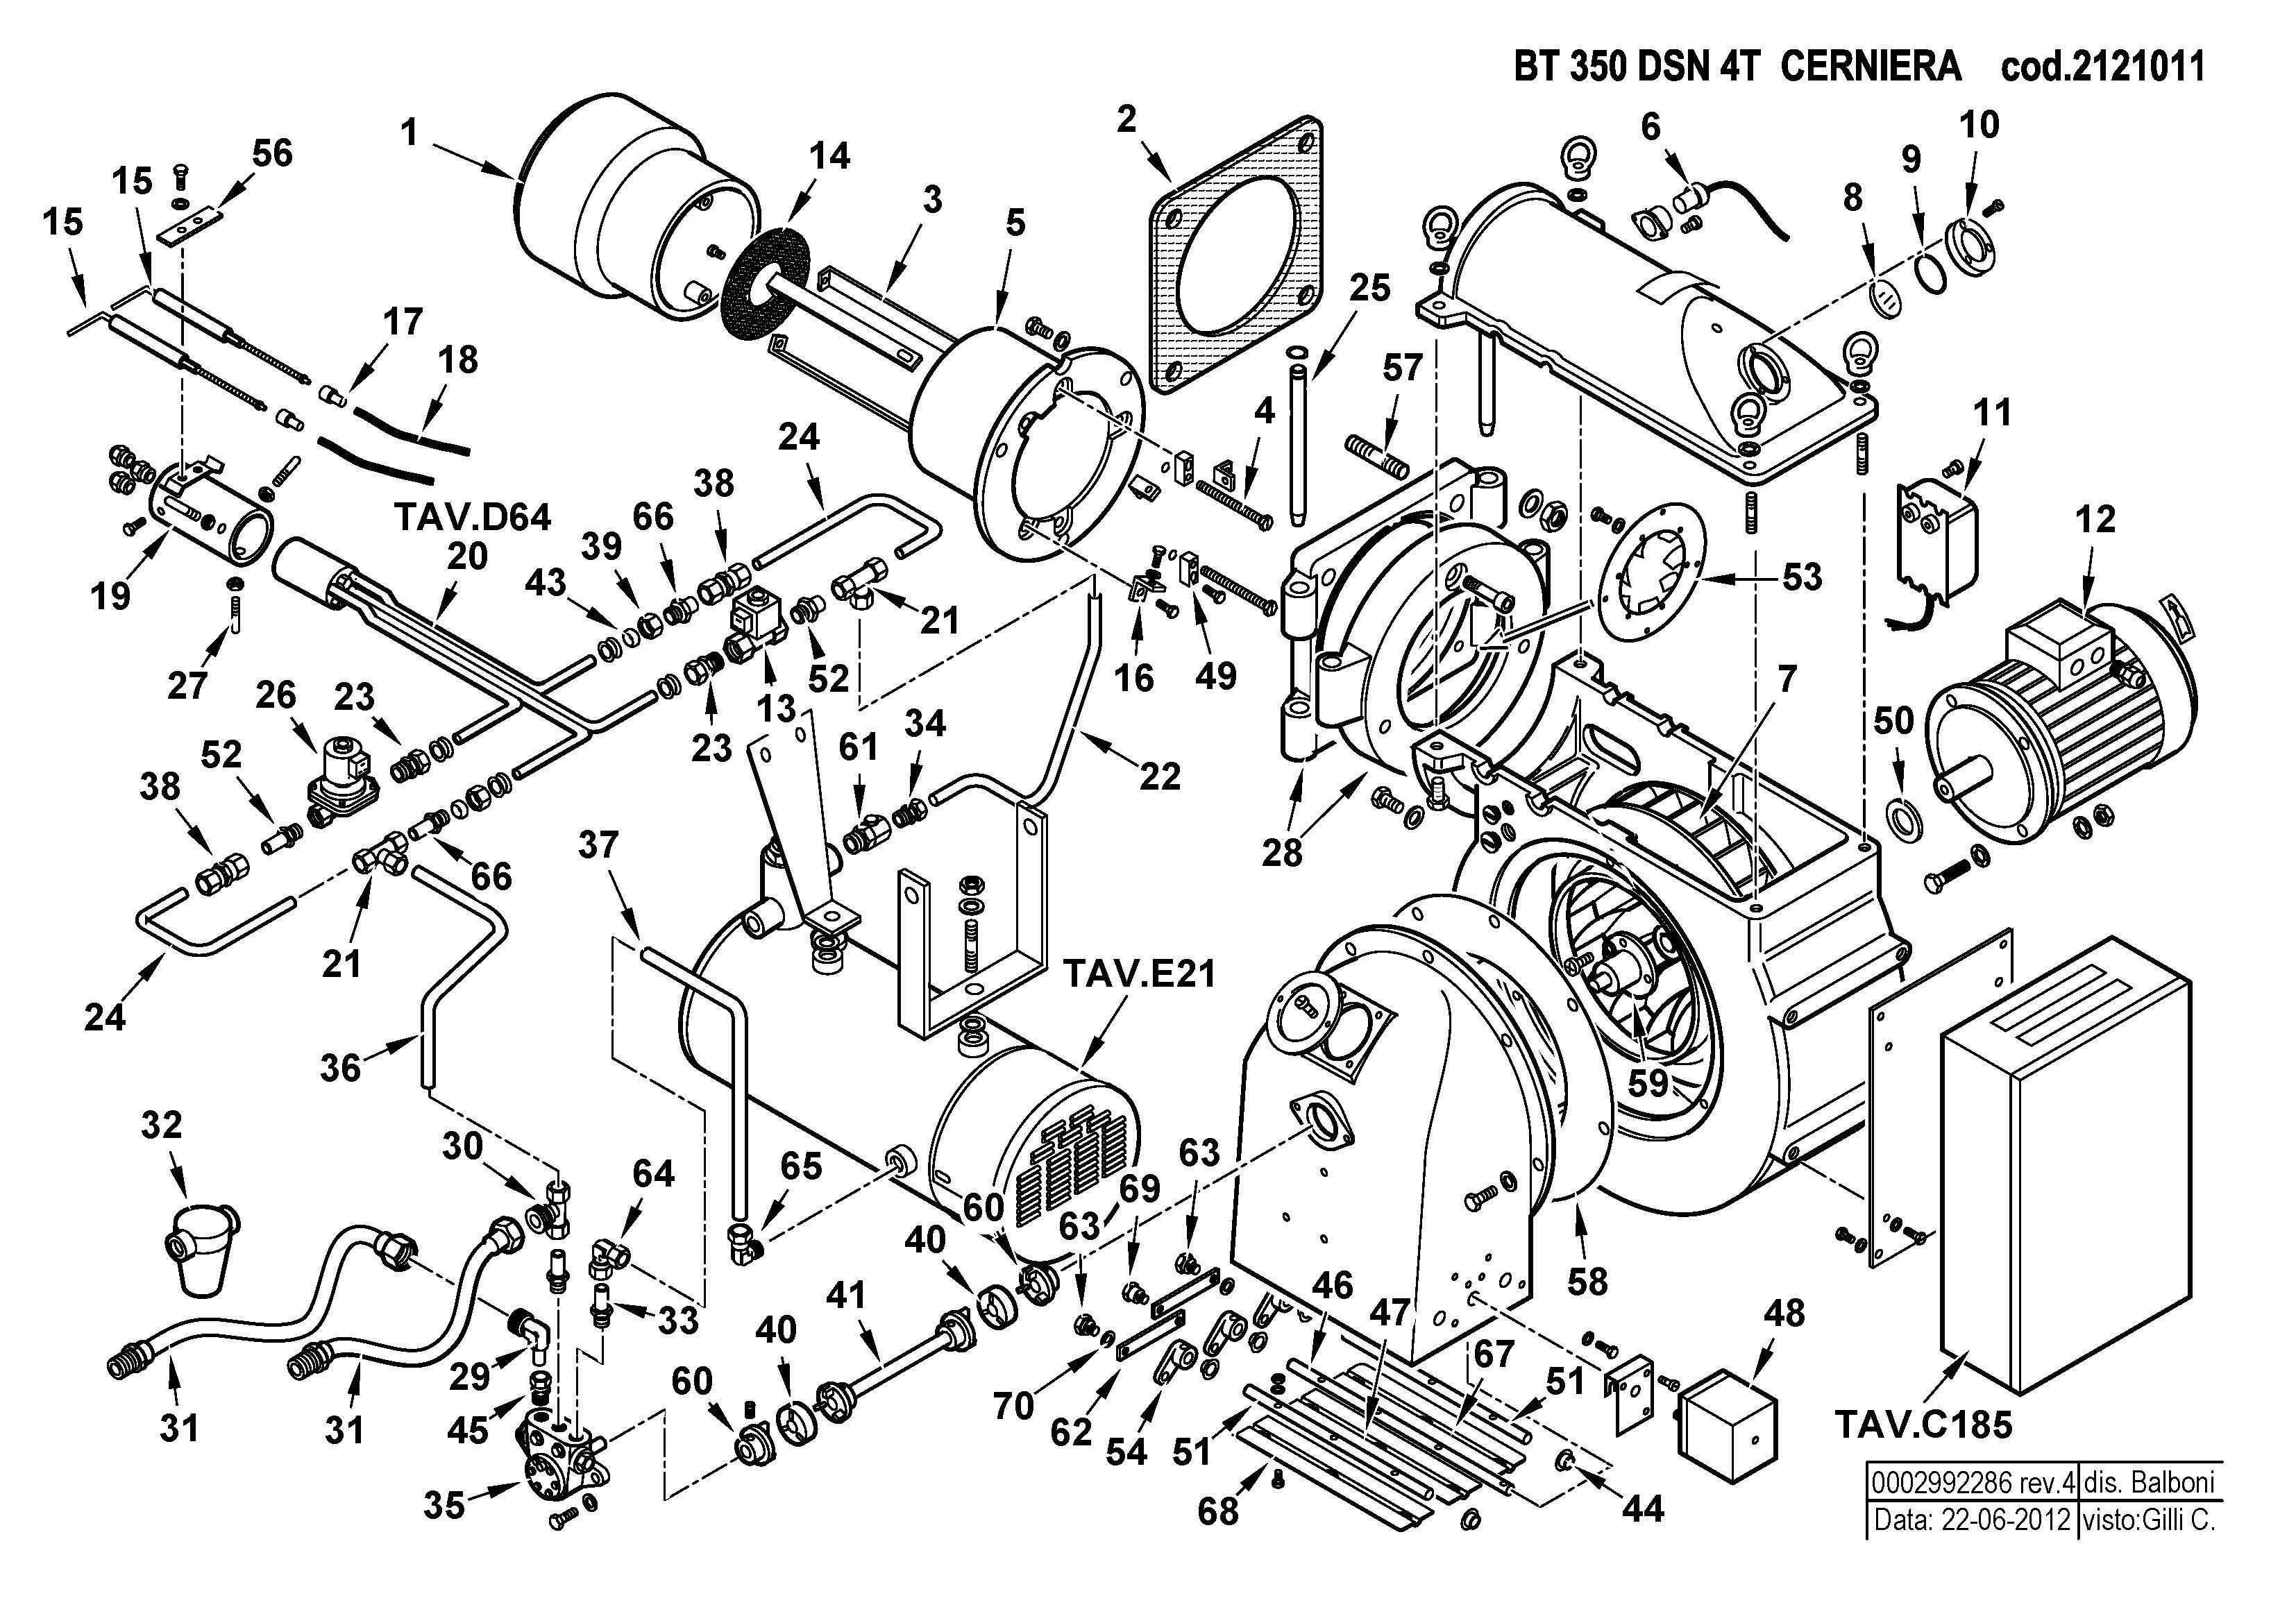 BT 350 DSN 4T Cerniera 2121011 4 20120622